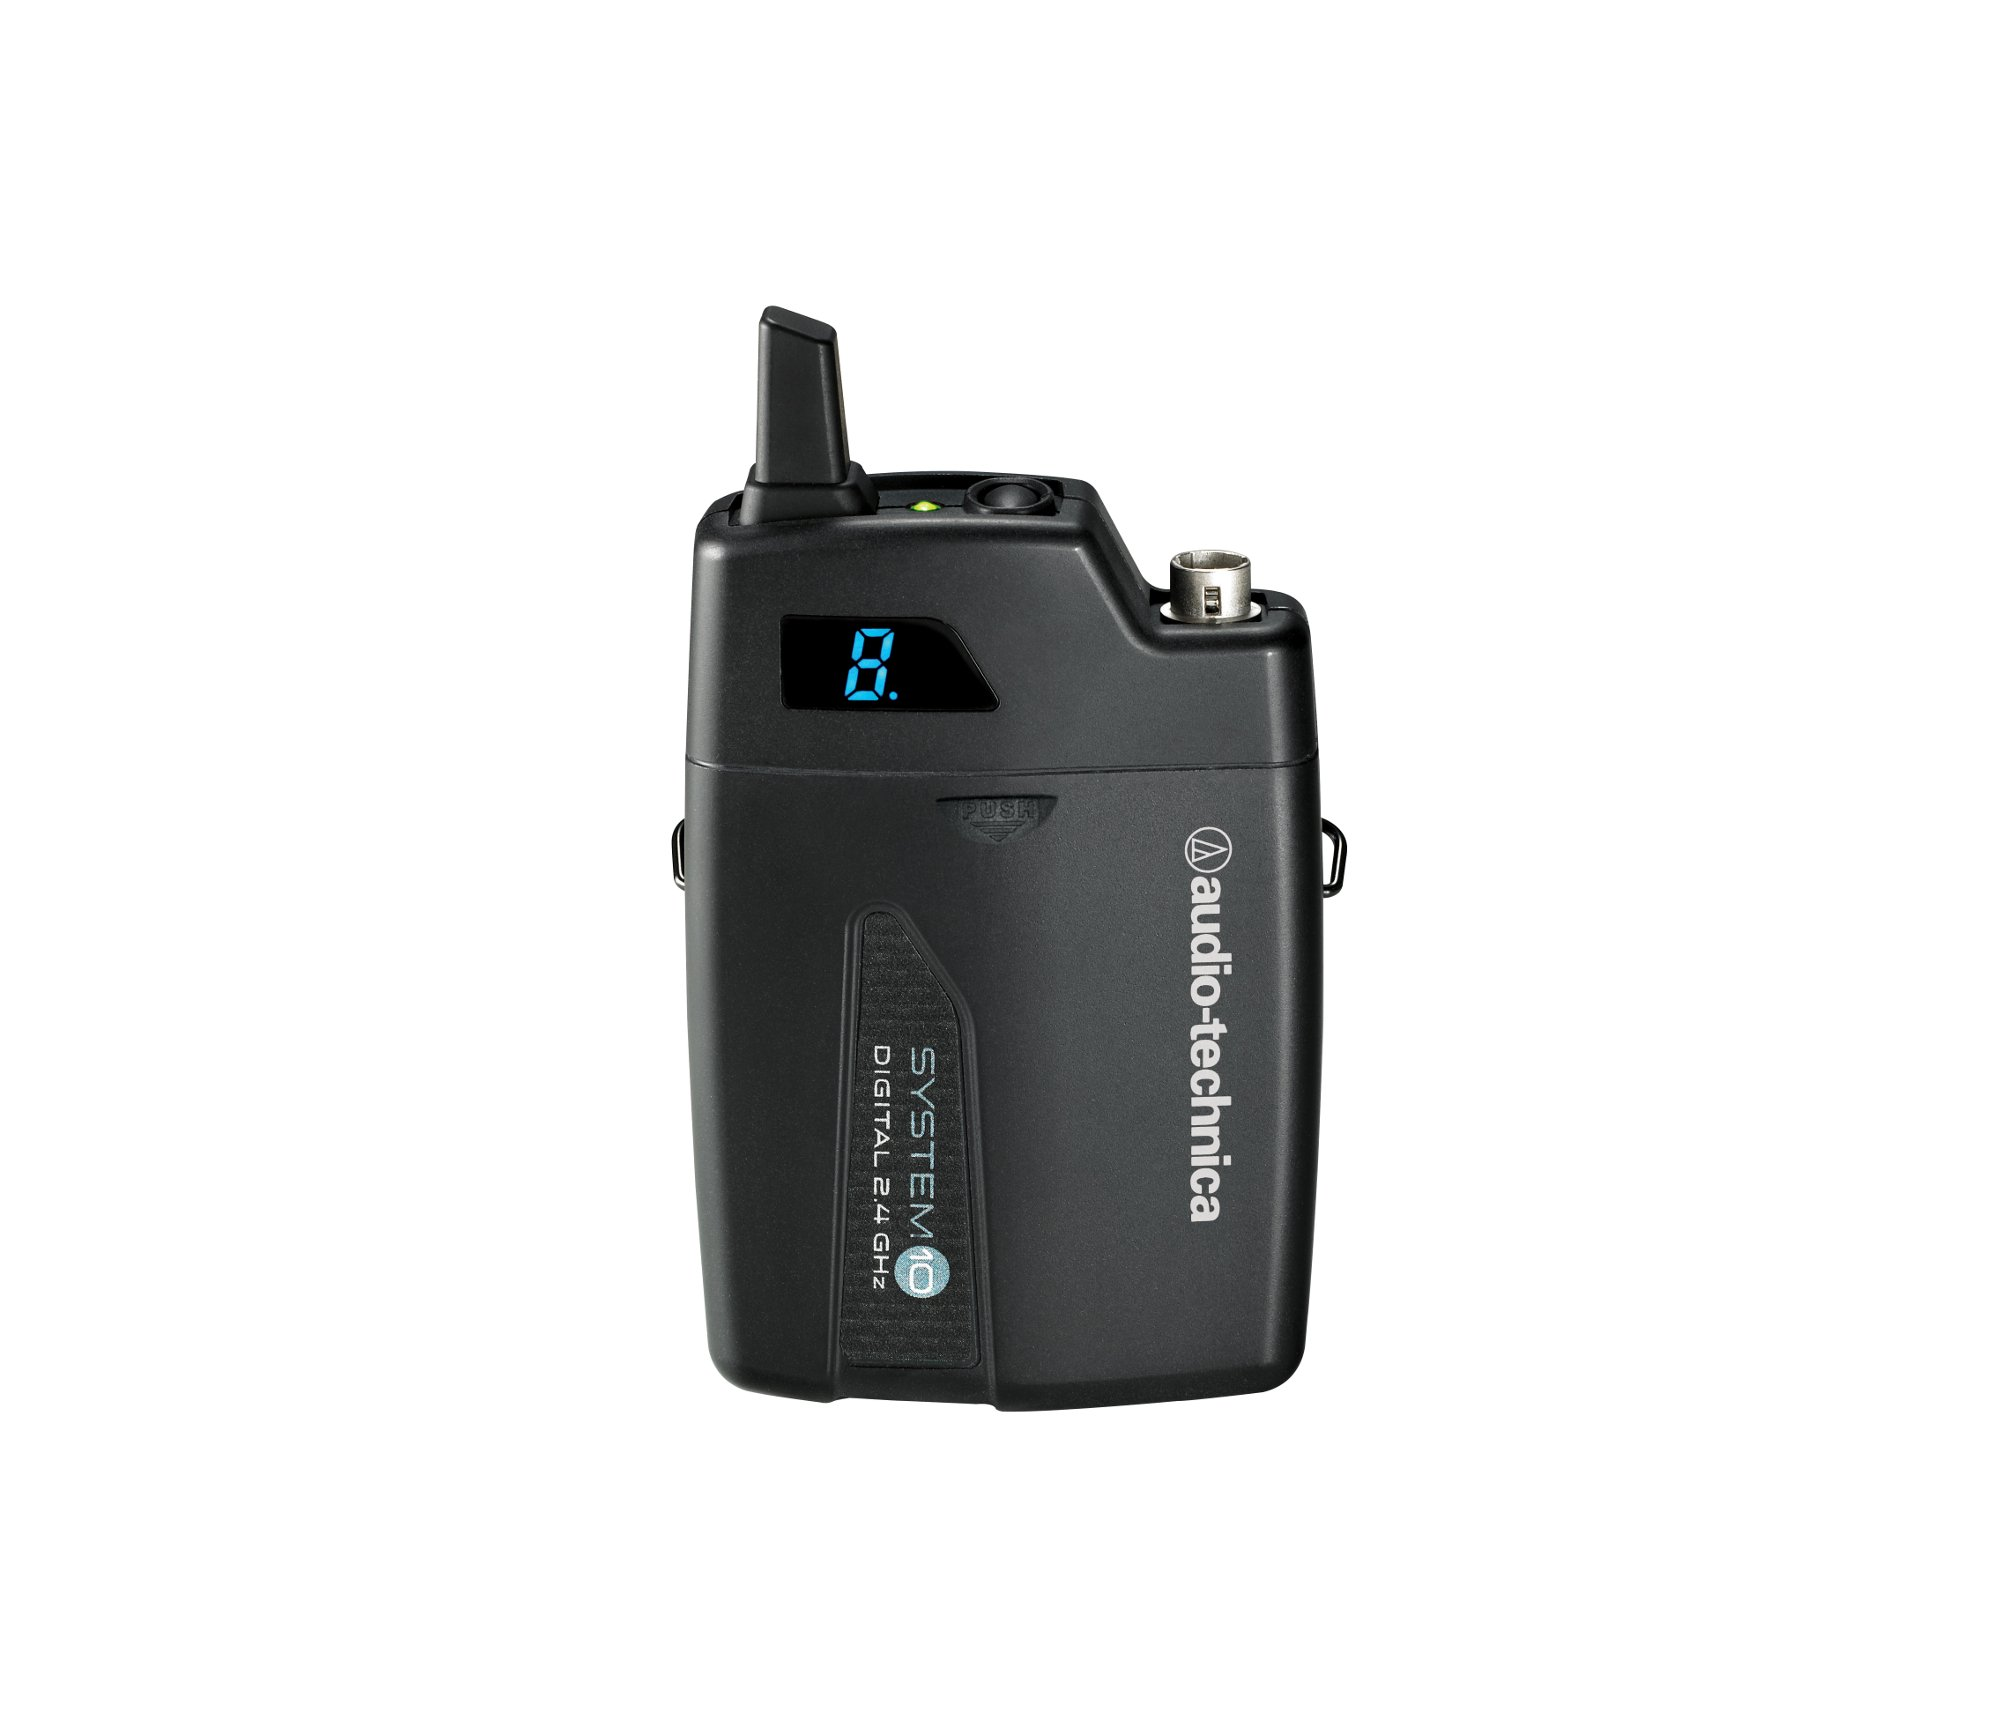 Audio-Technica ATW-T1001 System 10 Wireless UniPak® Transmitter ATW-T1001